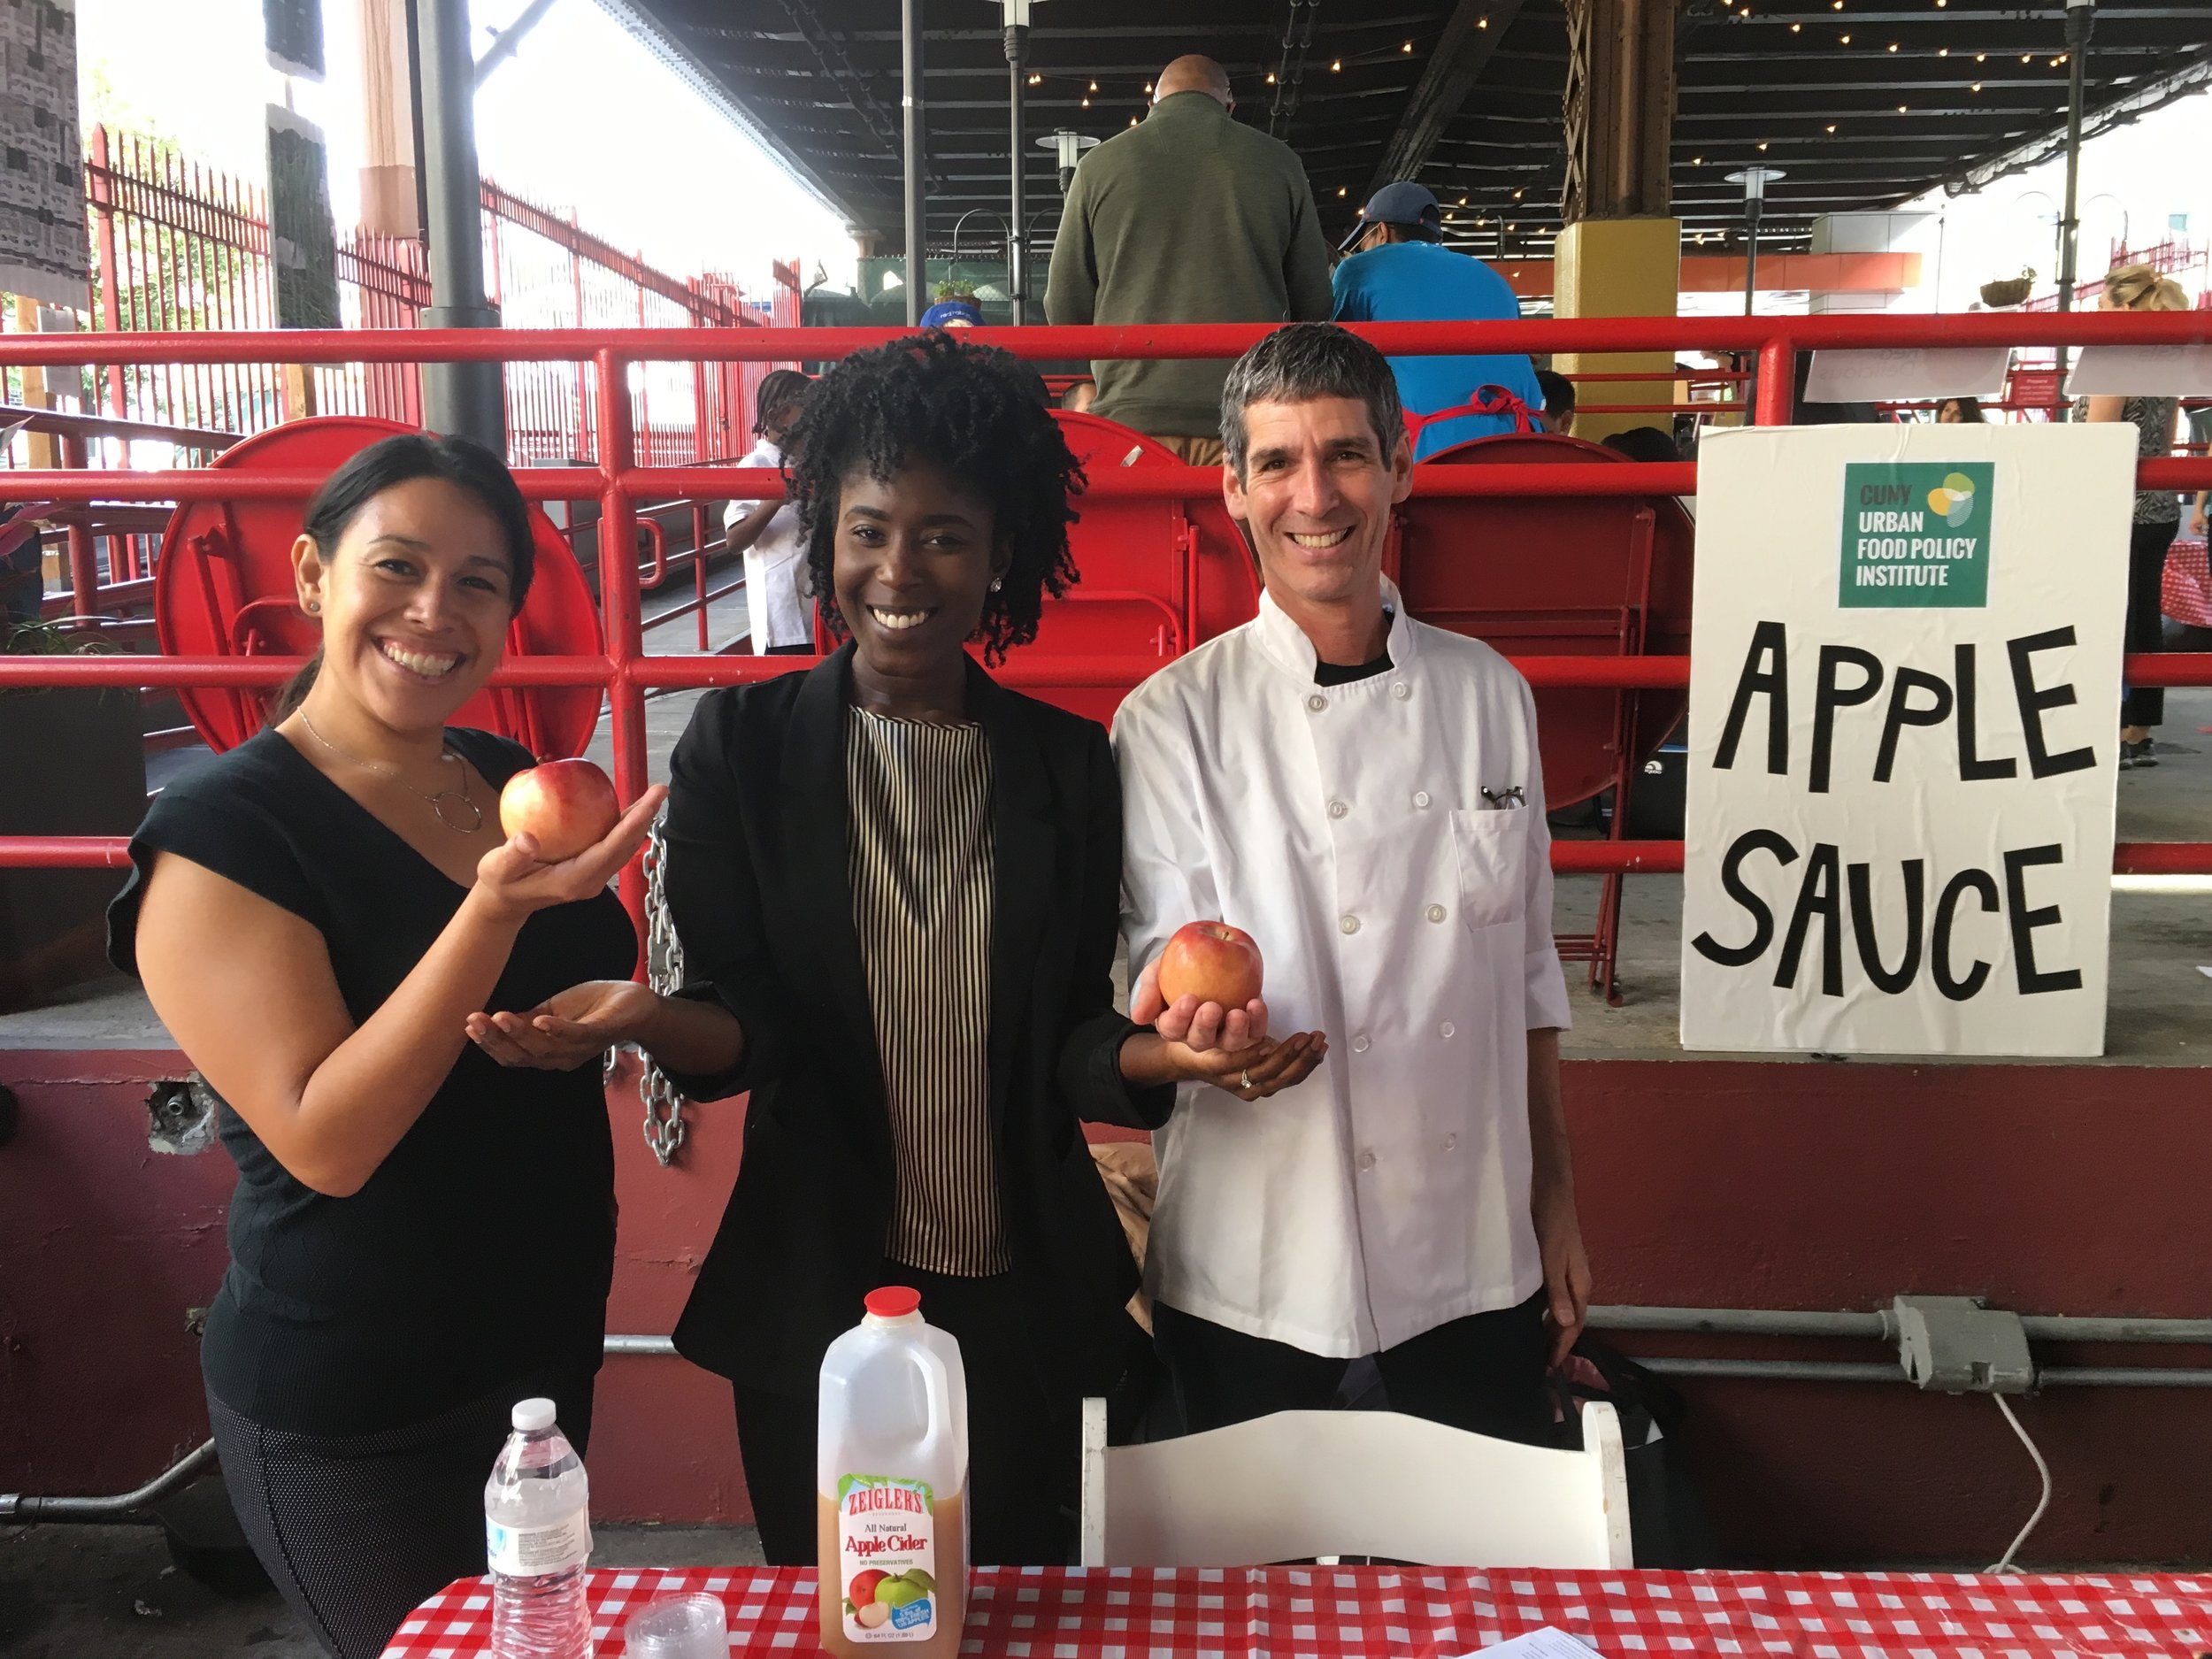 CUNY Urban Food Policy Institute staffers, from left: Sarah Garza, Charita Johnson, and Lorne Feldman